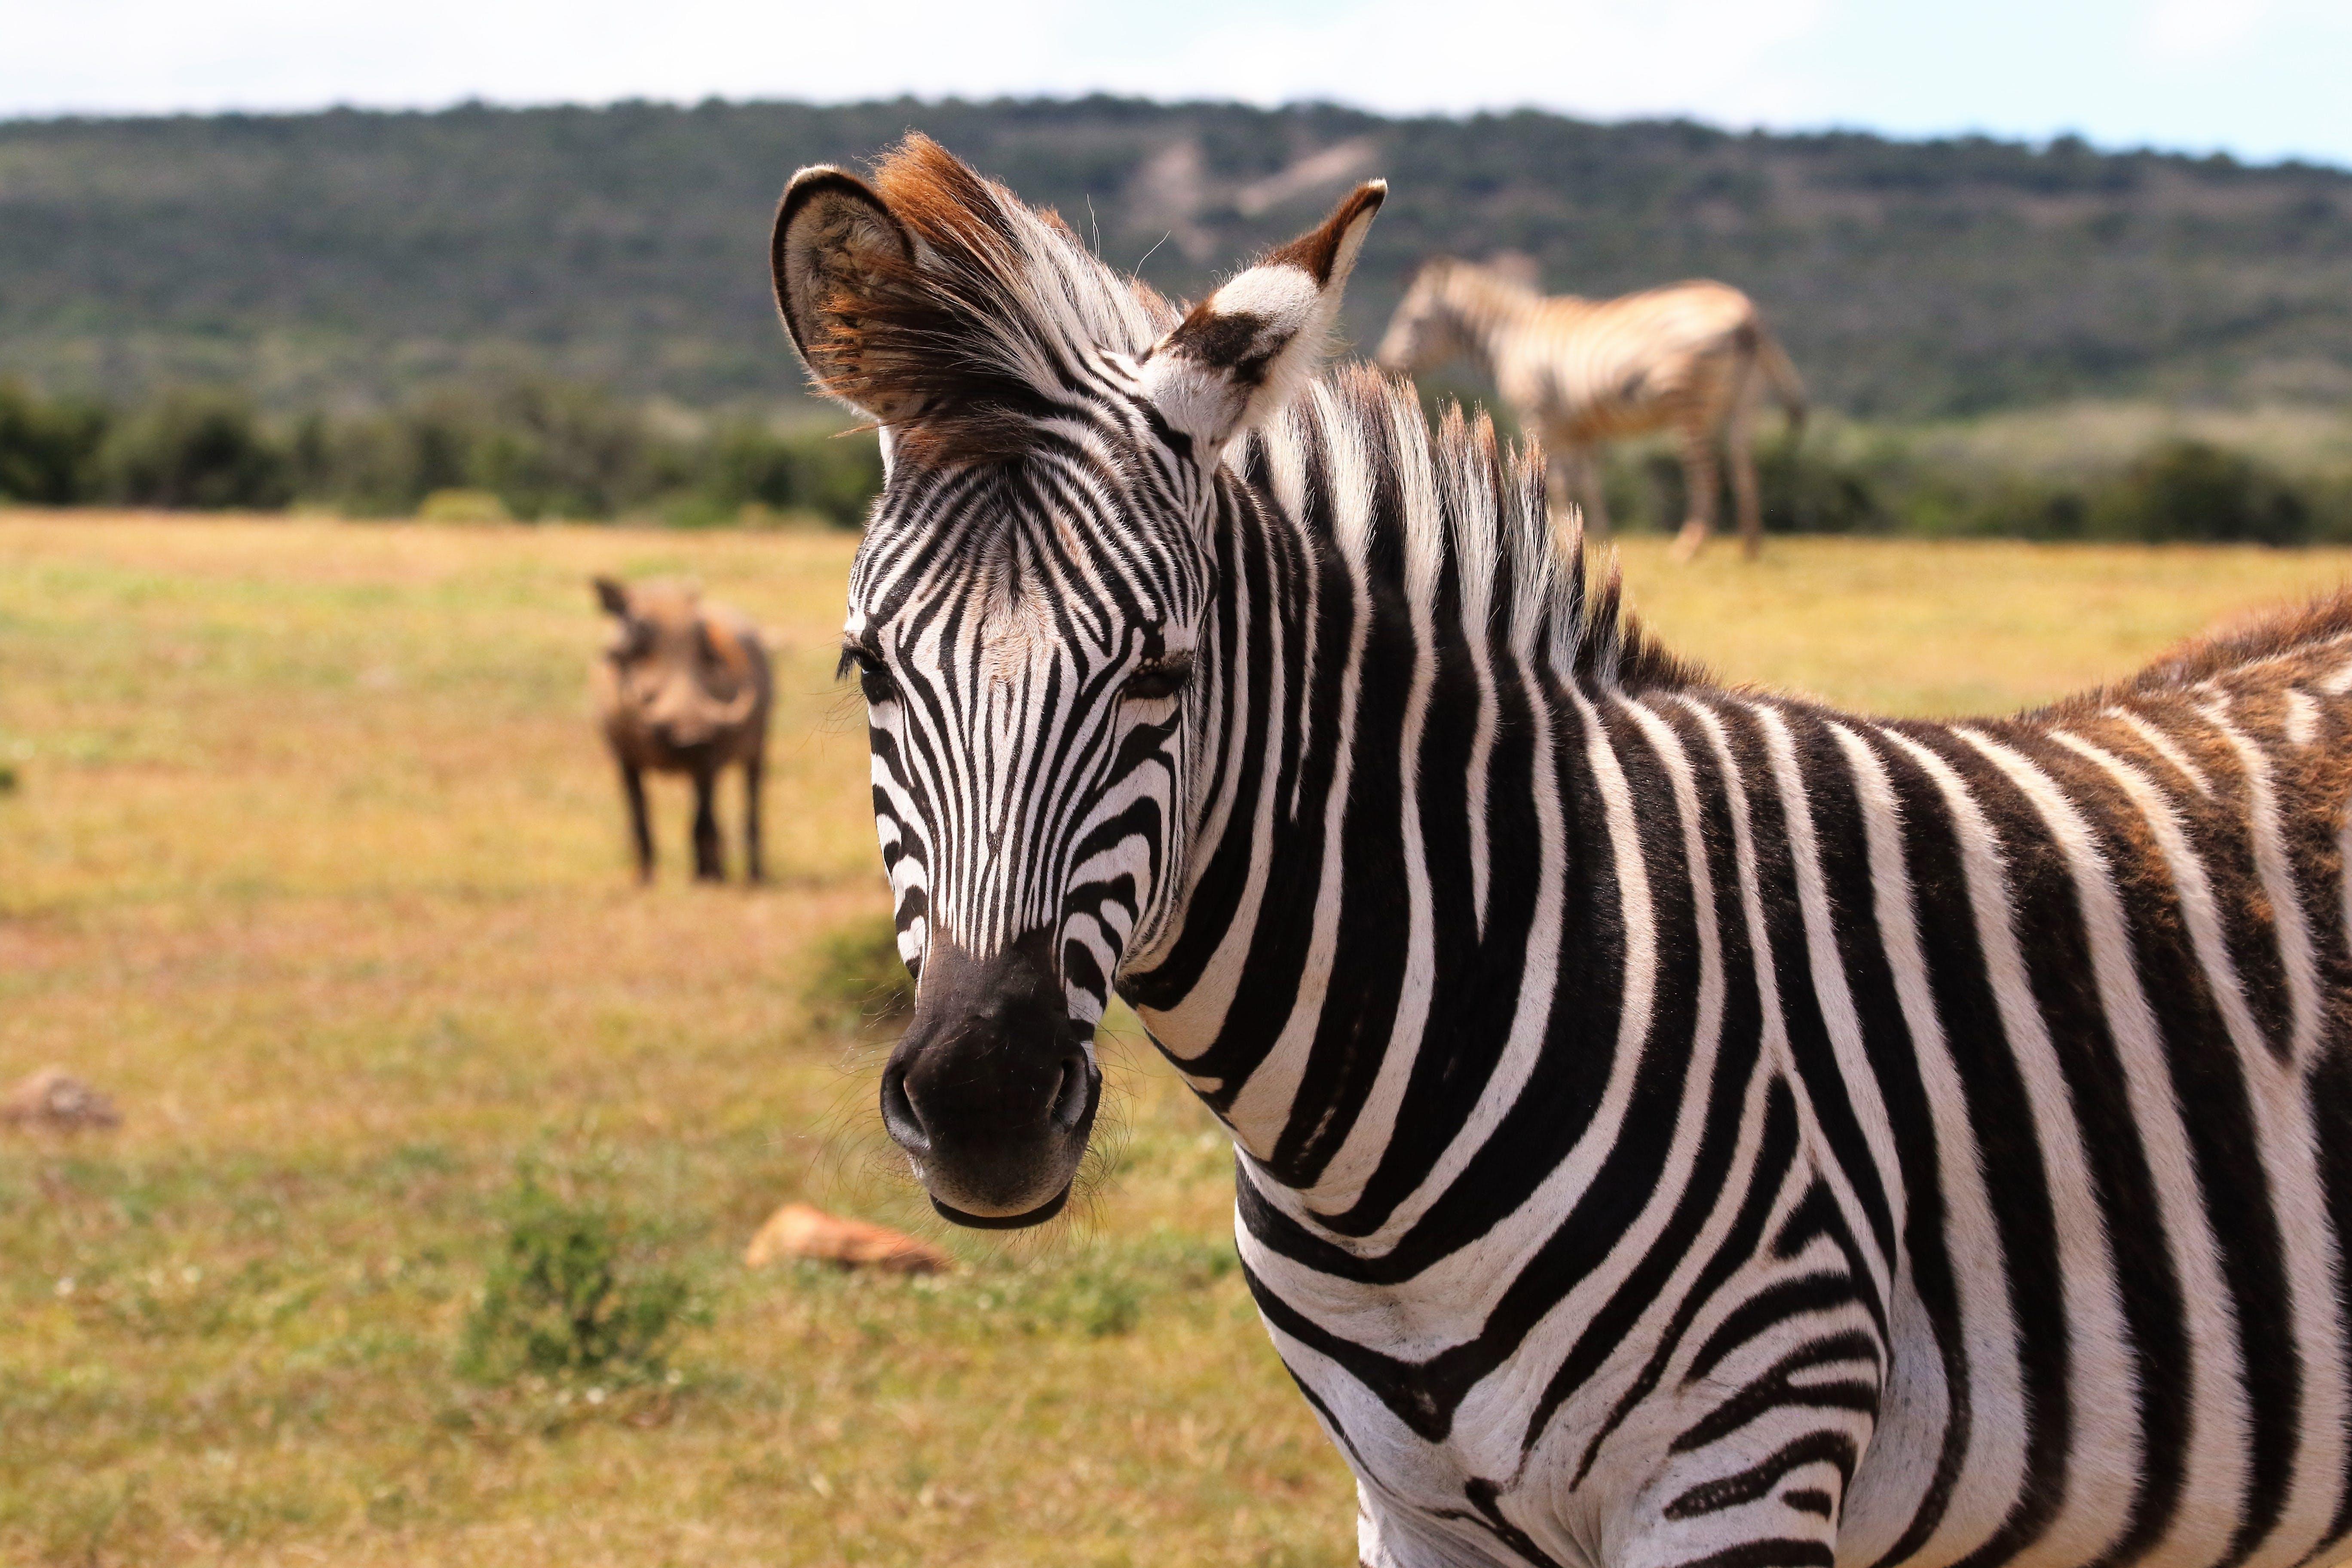 Zebra on Green Grass Field